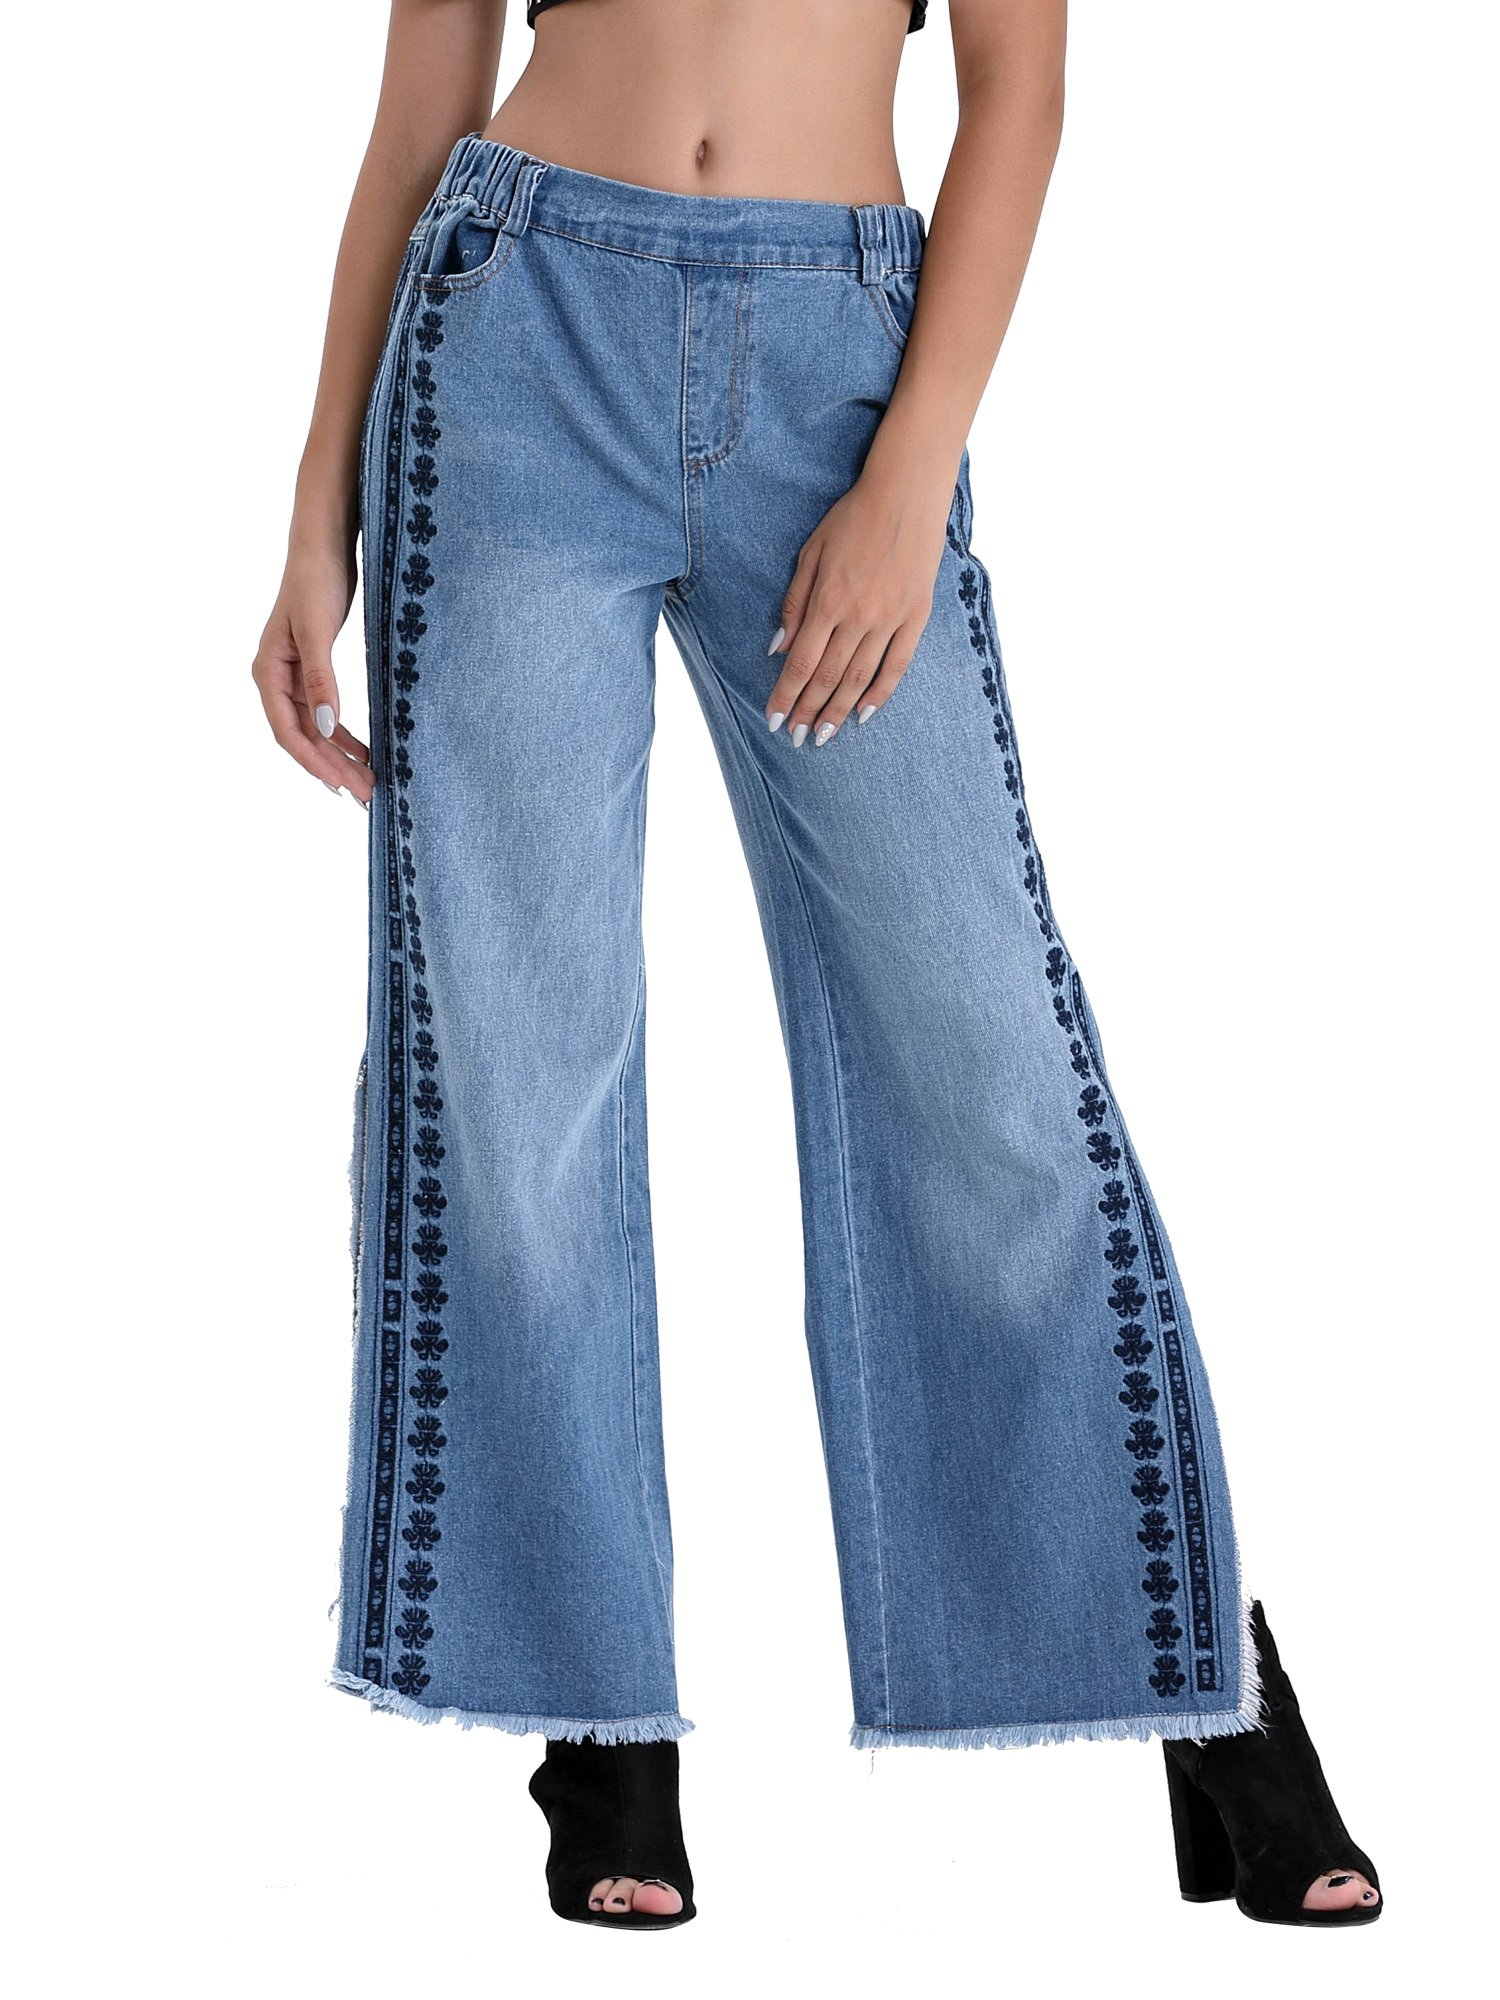 BARGOOS Women Summer Casual Elastic Wide Leg Jeans Denim Pants